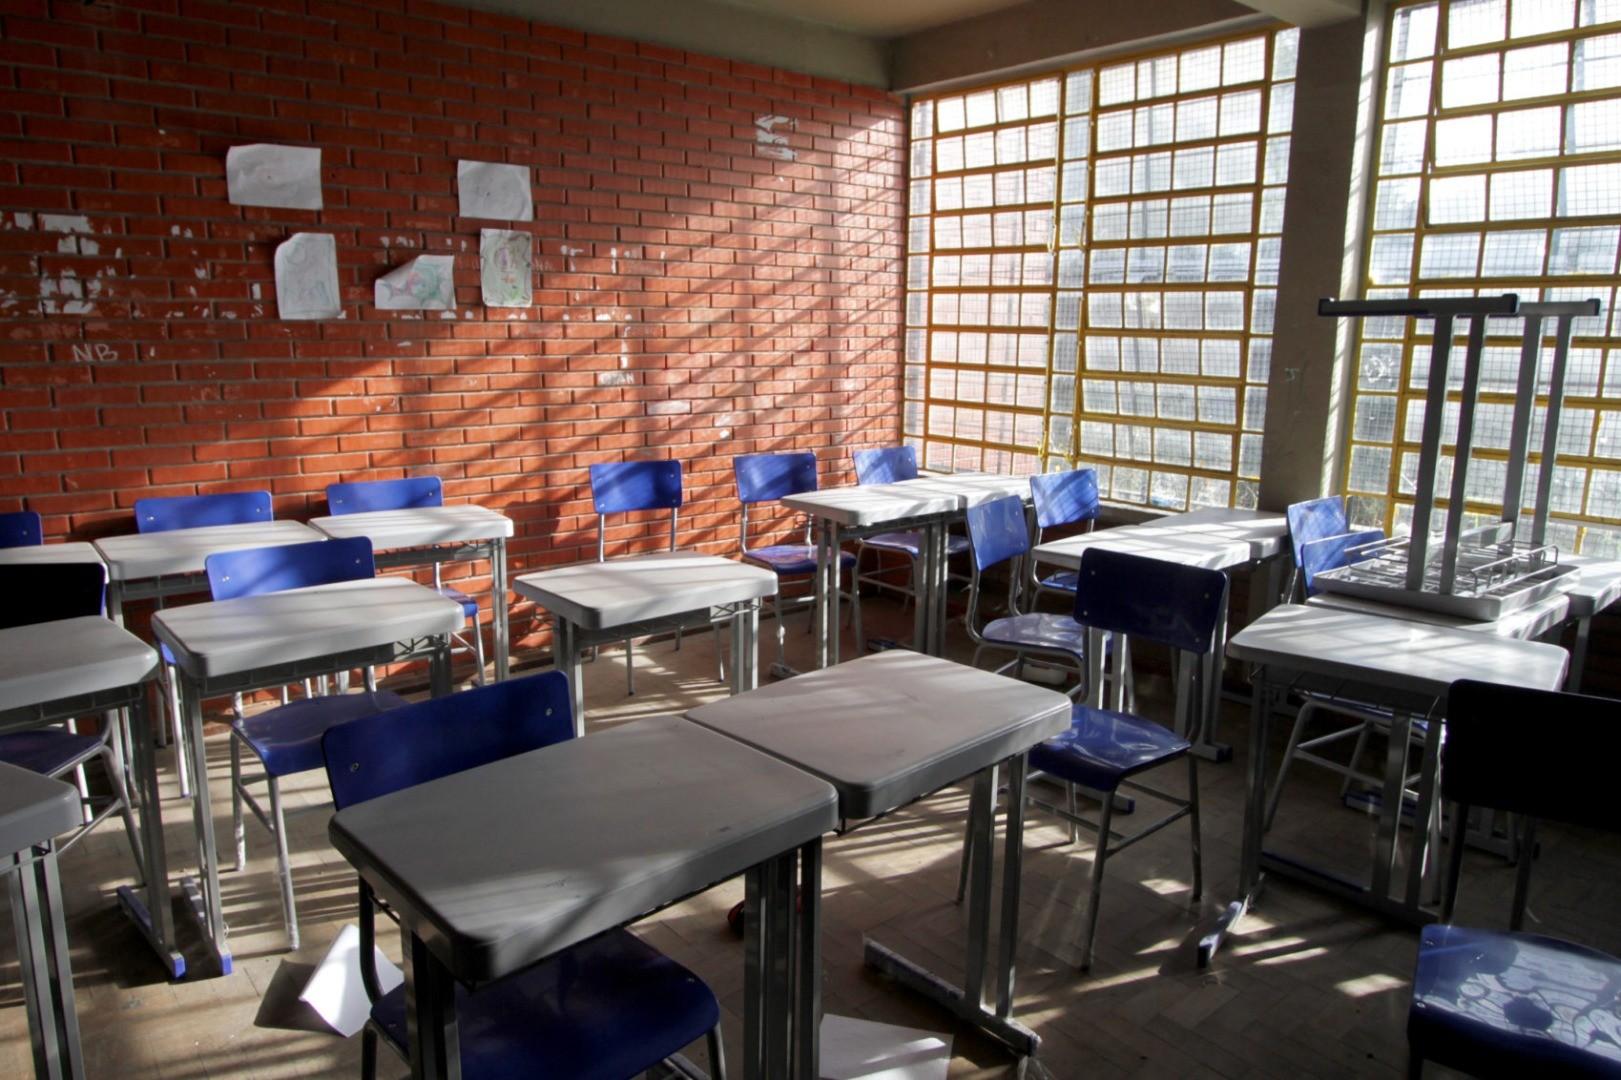 Governo do RS propõe a prefeitos volta das aulas presenciais a partir de 31 de agosto